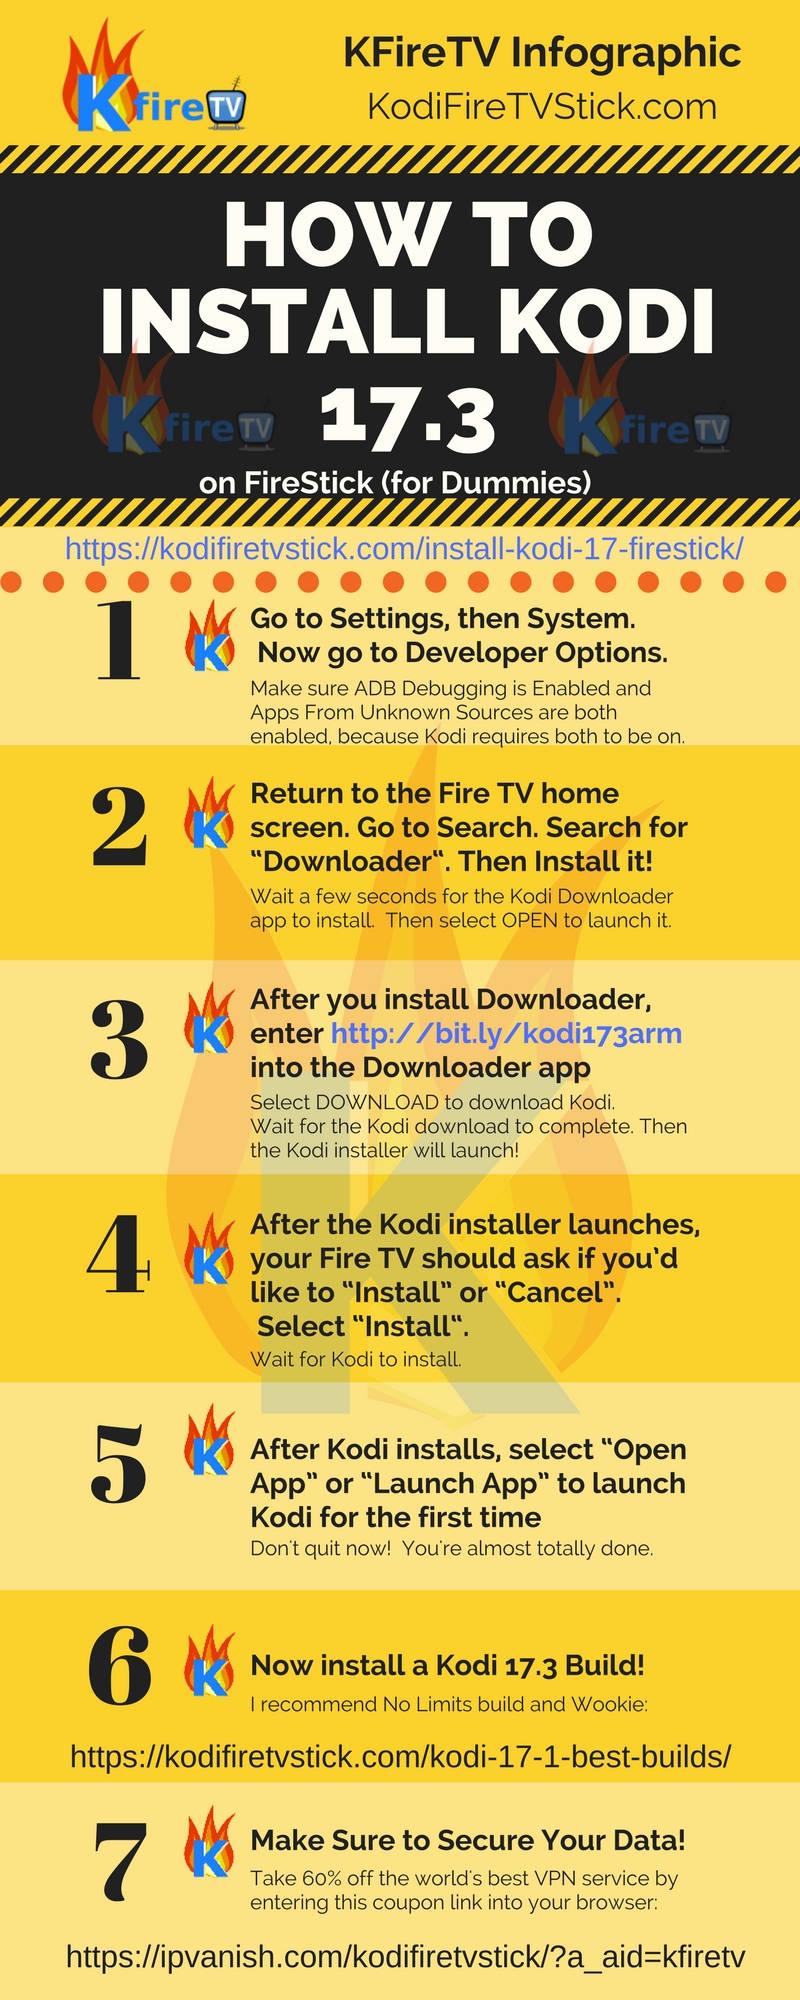 Kodi-17.3-Firestick-Install-Infographic-Plus-No-Limits-Magic-Build-Compressed